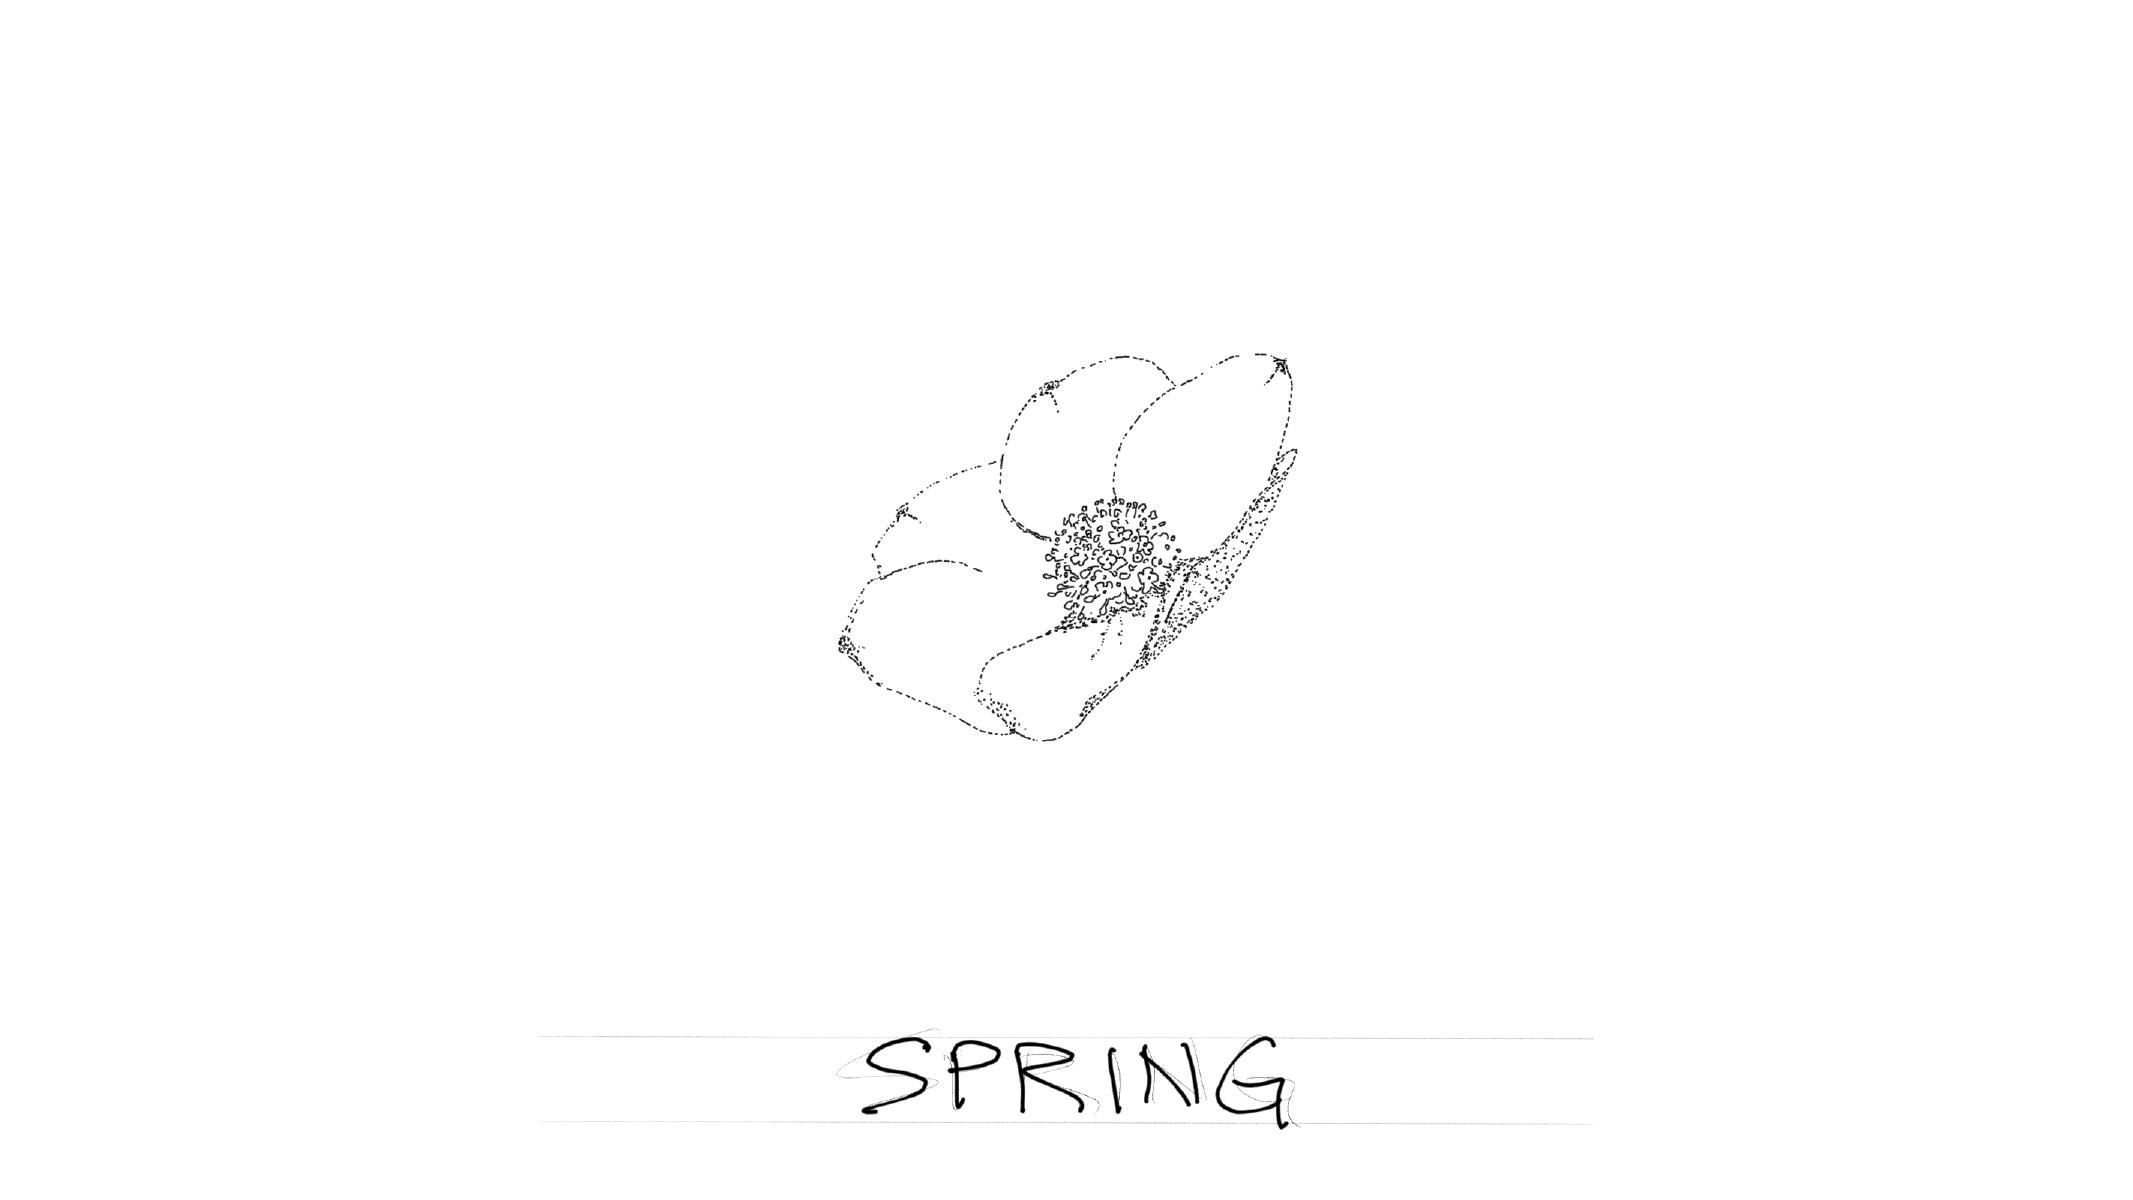 Flashcard: Spring